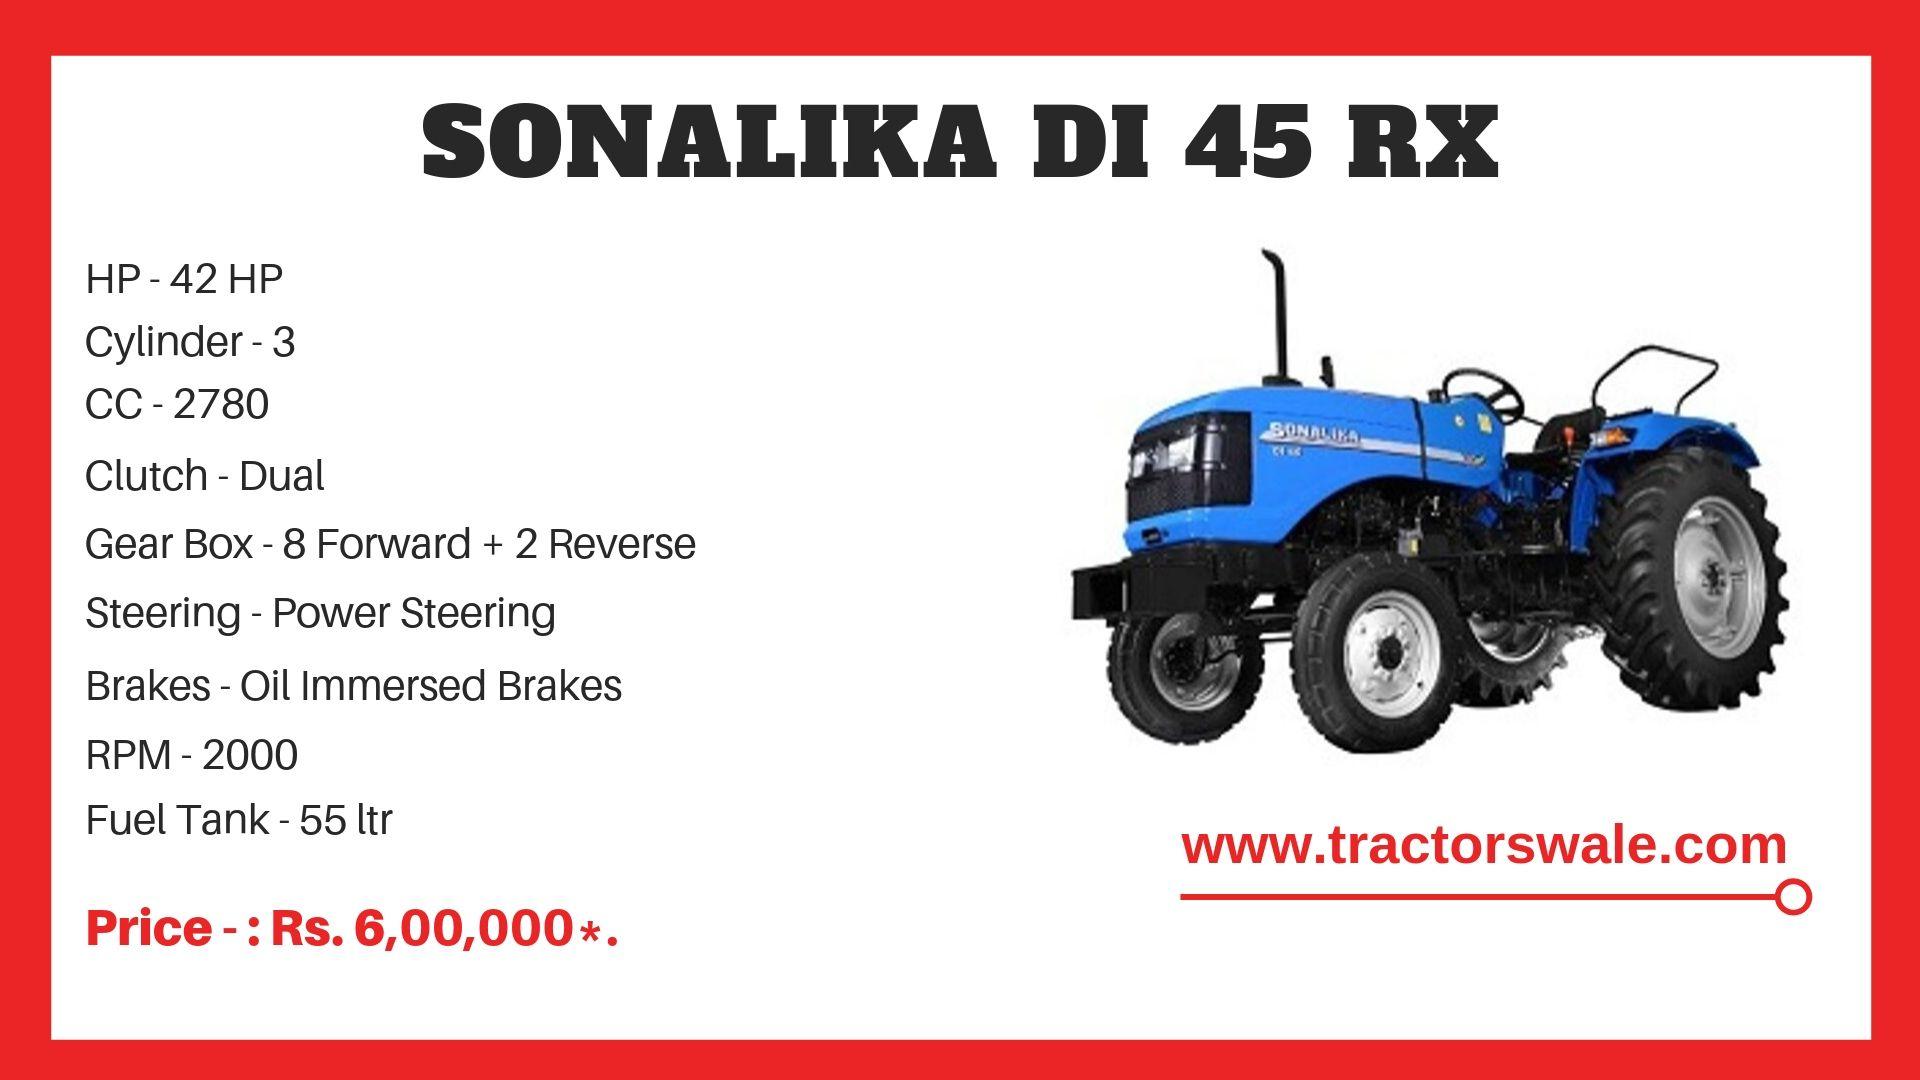 Sonalika DI 45 RX tractor spwcs